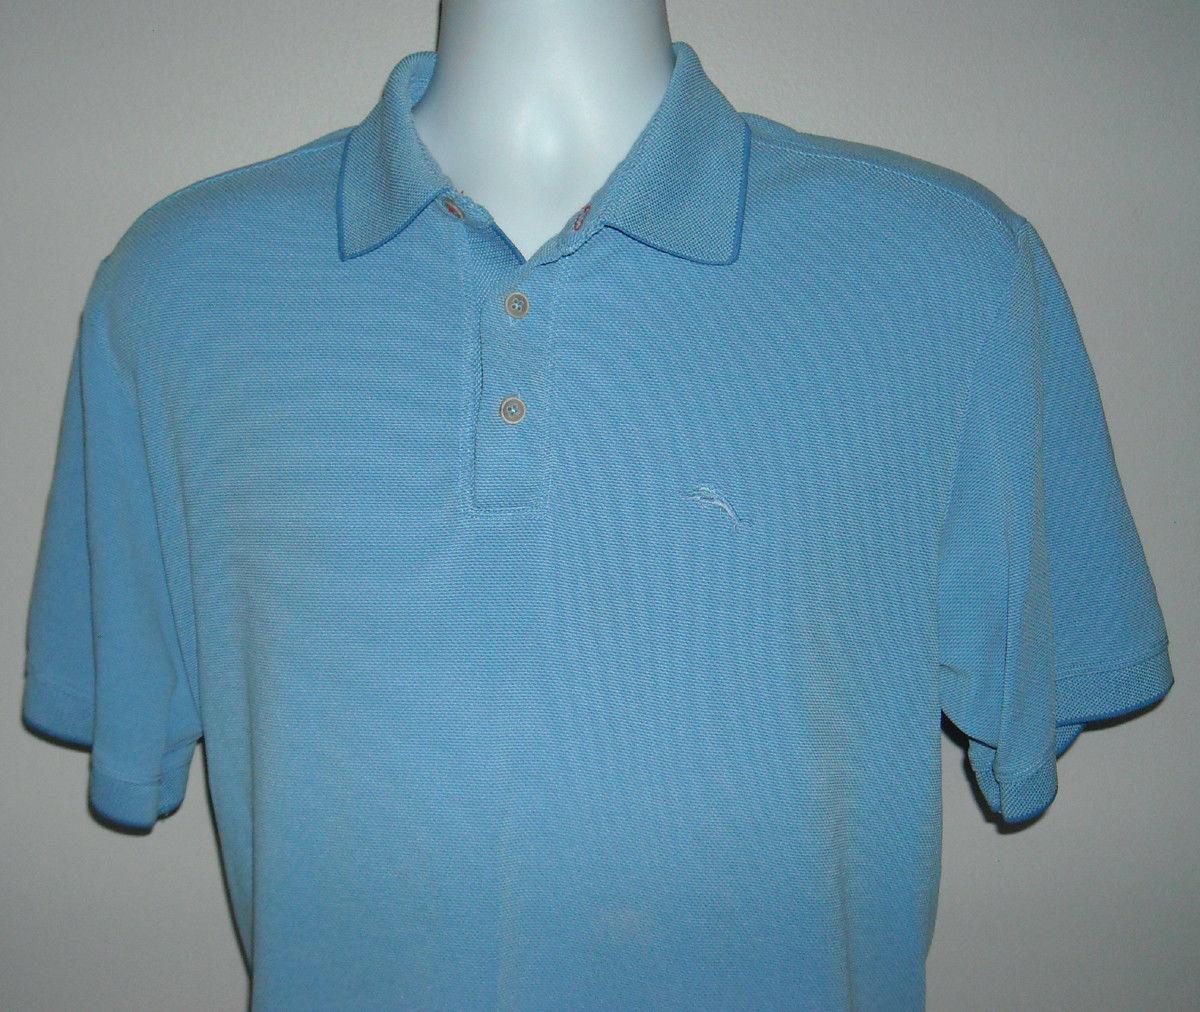 Mens Tommy Bahama Polo Shirt Medium embroidered marlin logo blue - $23.71